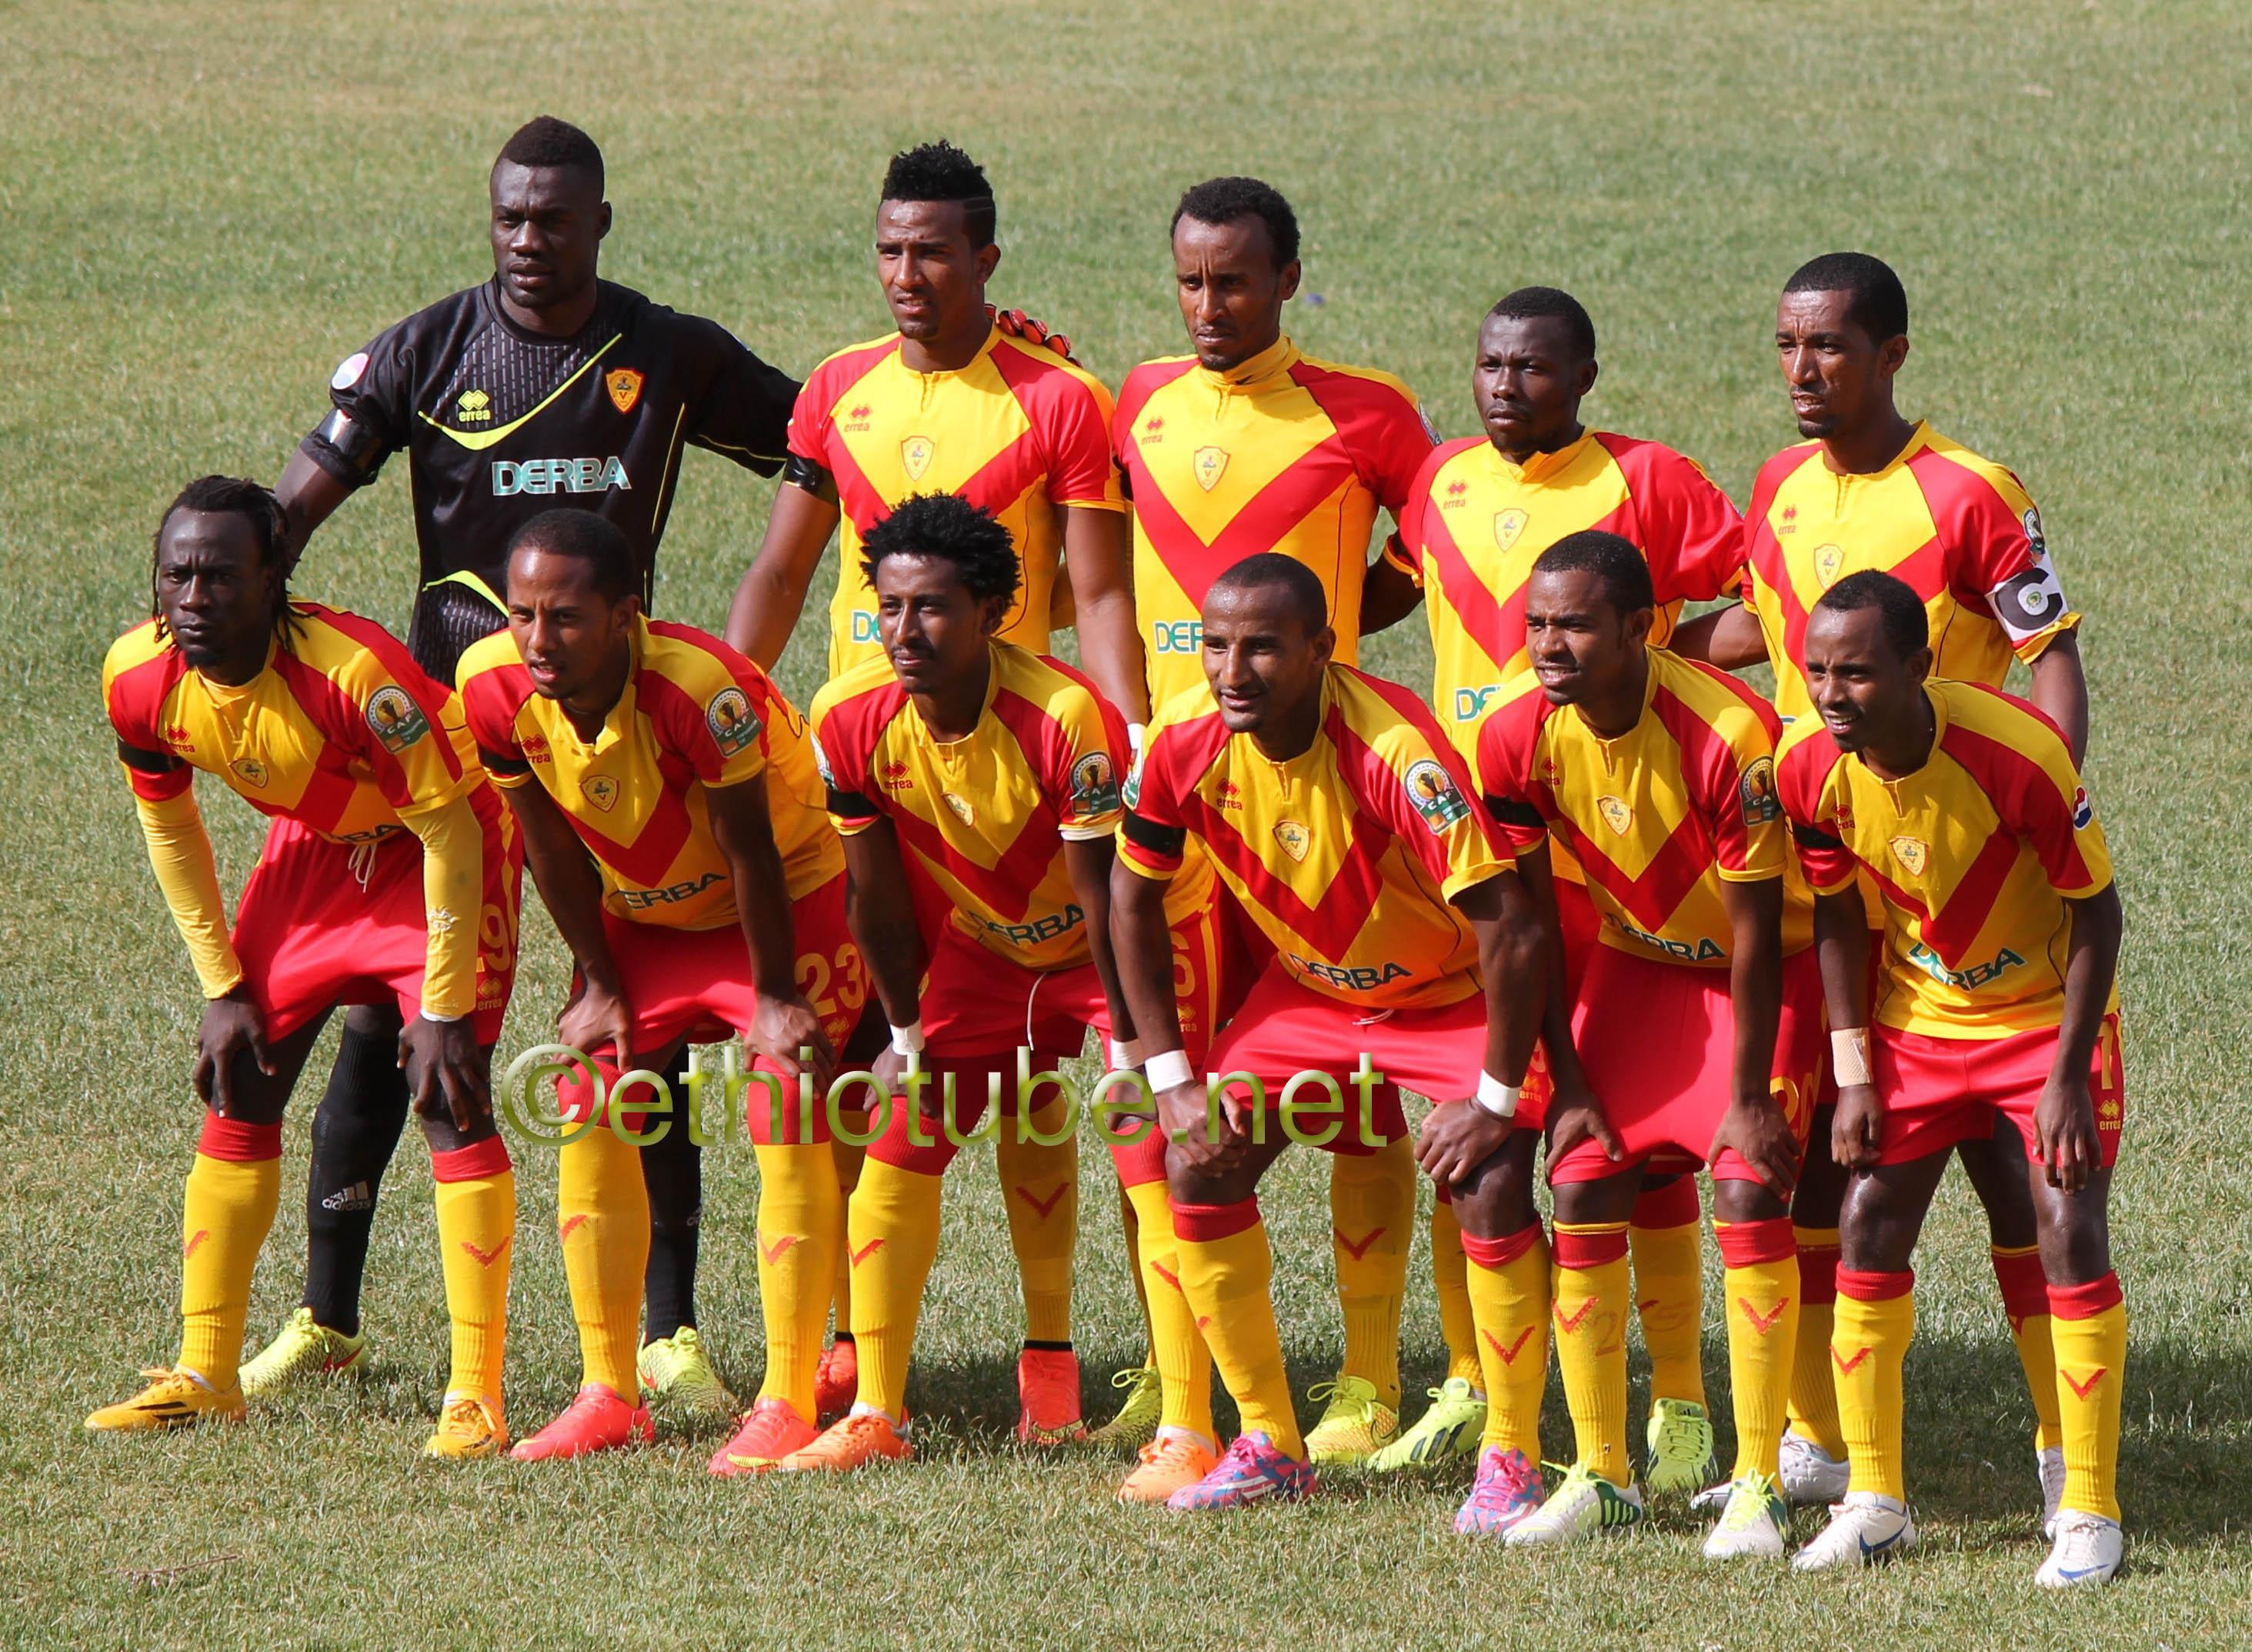 St. George team first 11 v Sidama